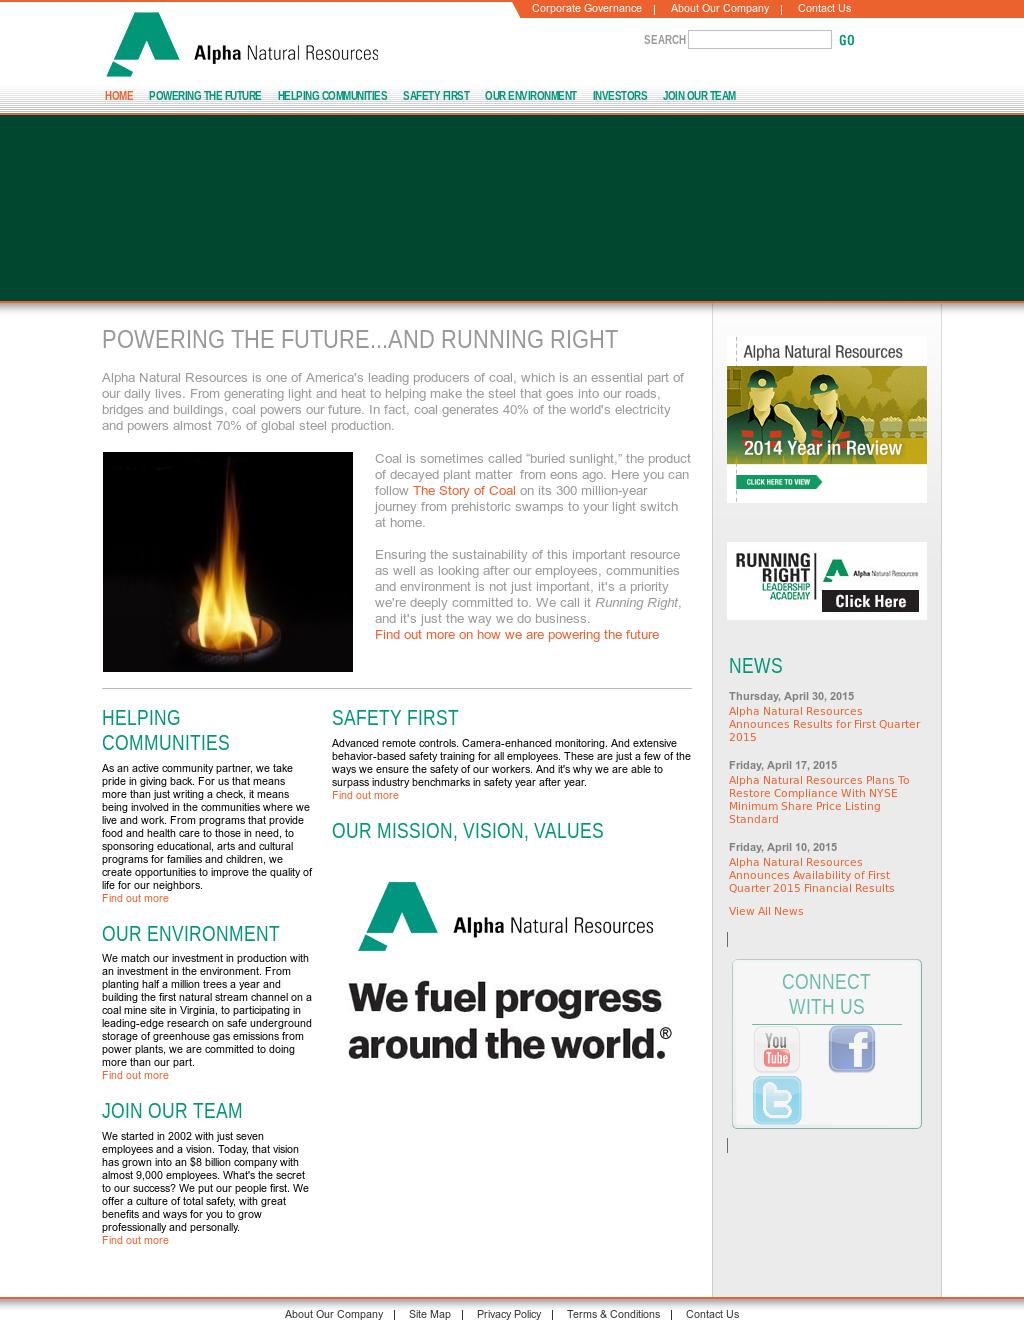 Alpha Natural Resources Company Profile